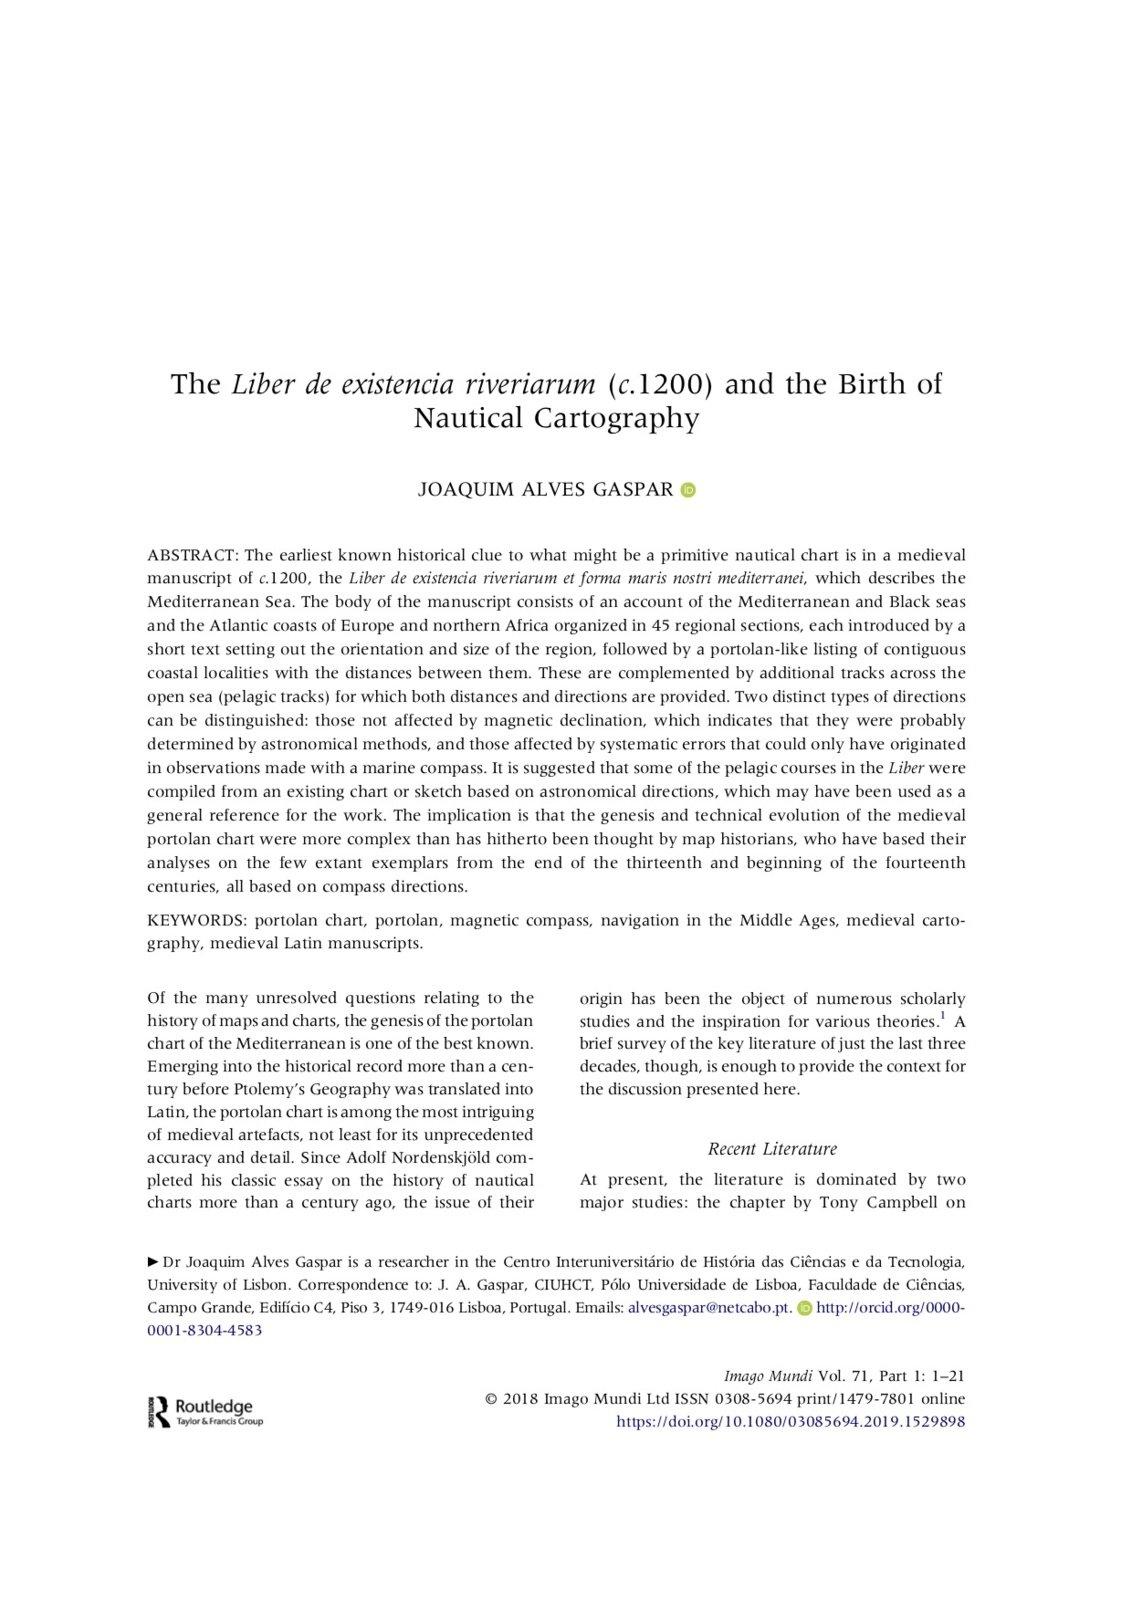 The Liber de existencia riveriarum (c.1200) and the Birth of Nautical Cartography, Capa